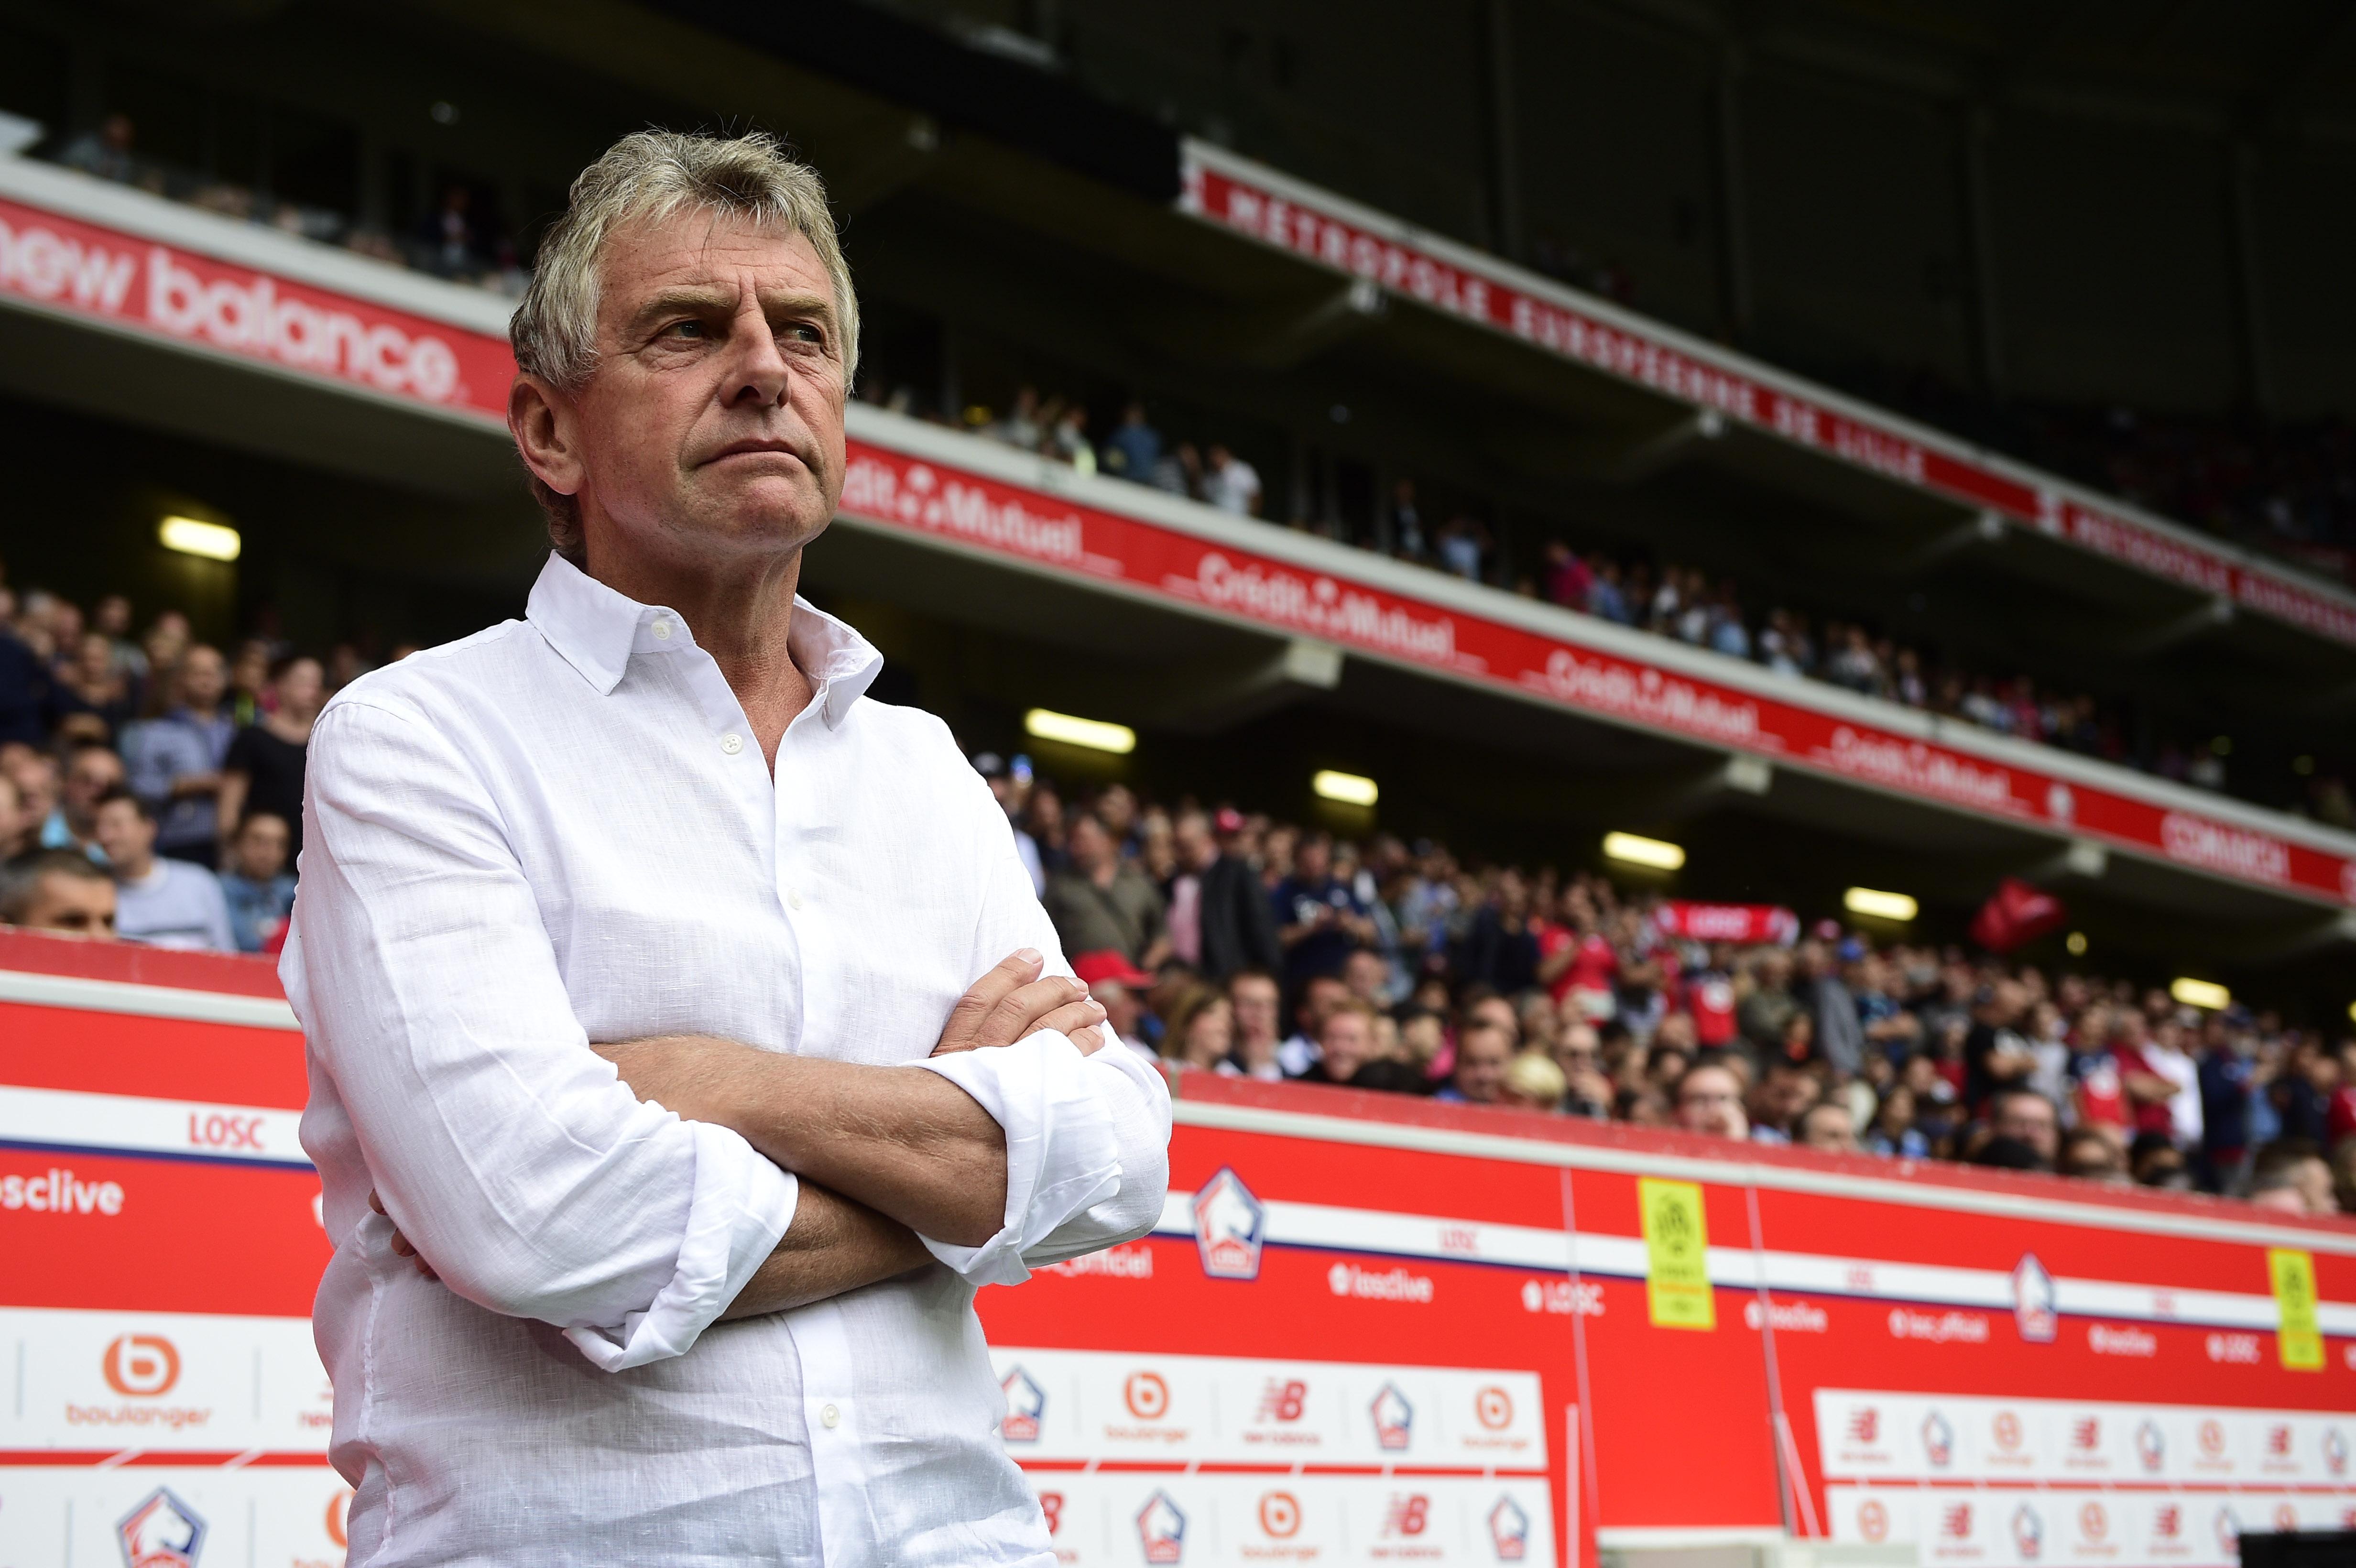 Football - Ligue 1 - A Nantes, Christian Gourcuff est déjà attendu au tournant